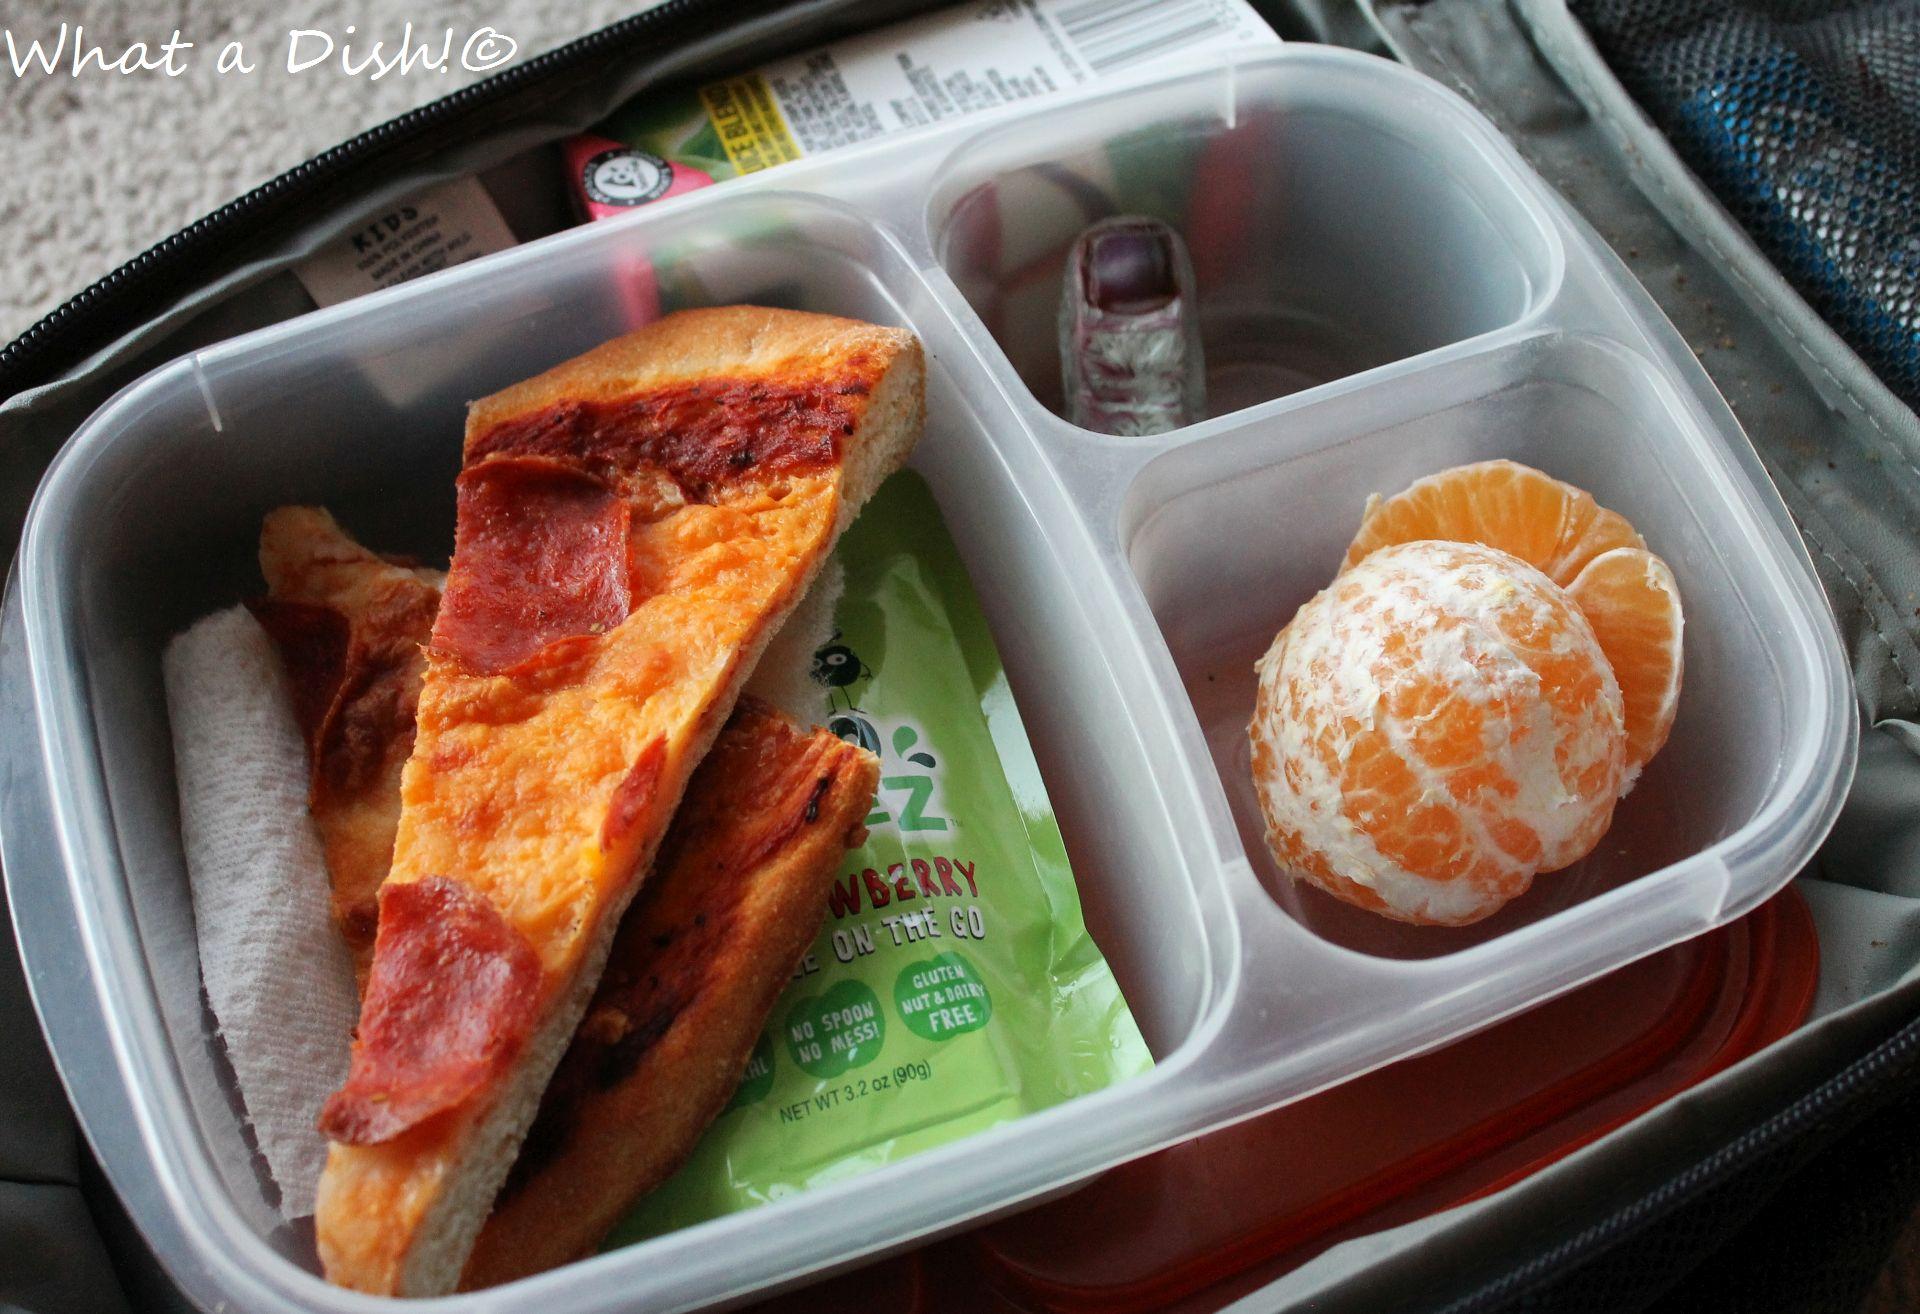 pizzaW